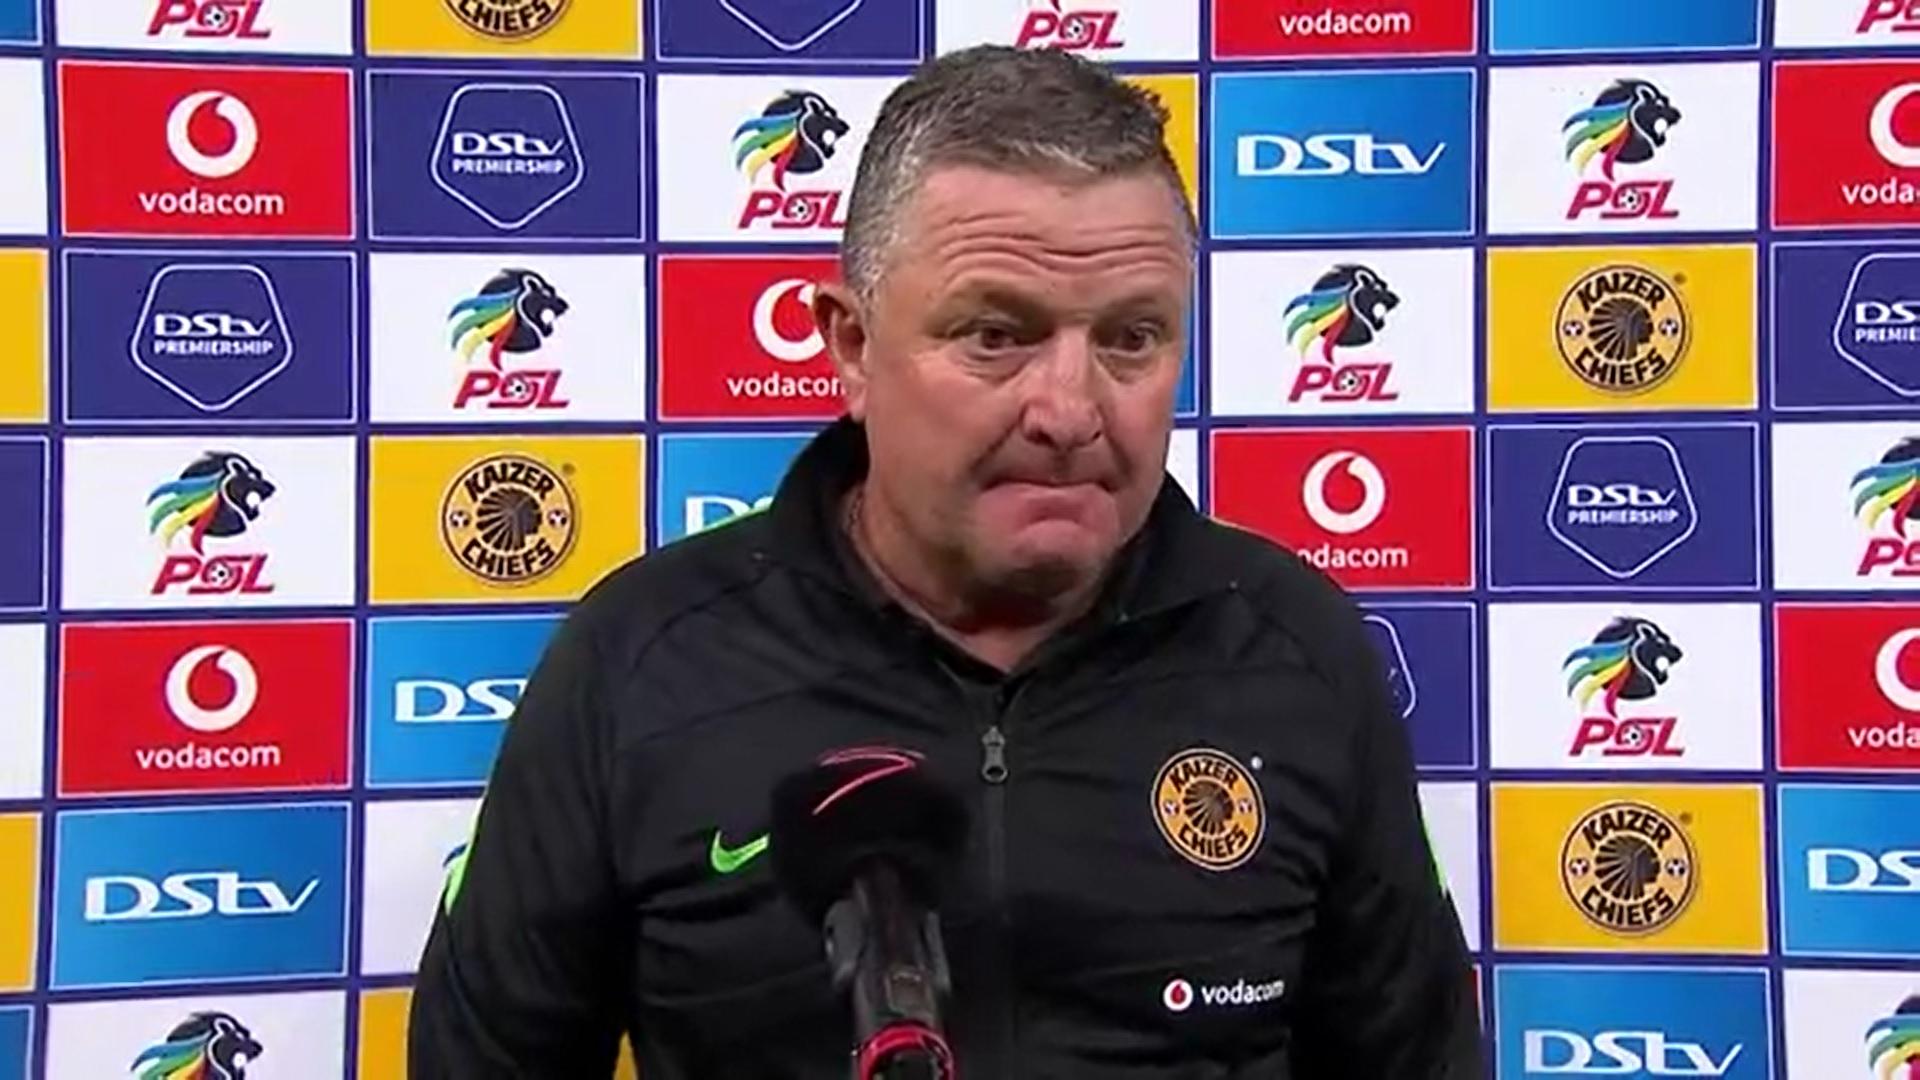 DStv Premiership | Kaizer Chiefs v Black Leopards | Post-match interview with Gavin Hunt